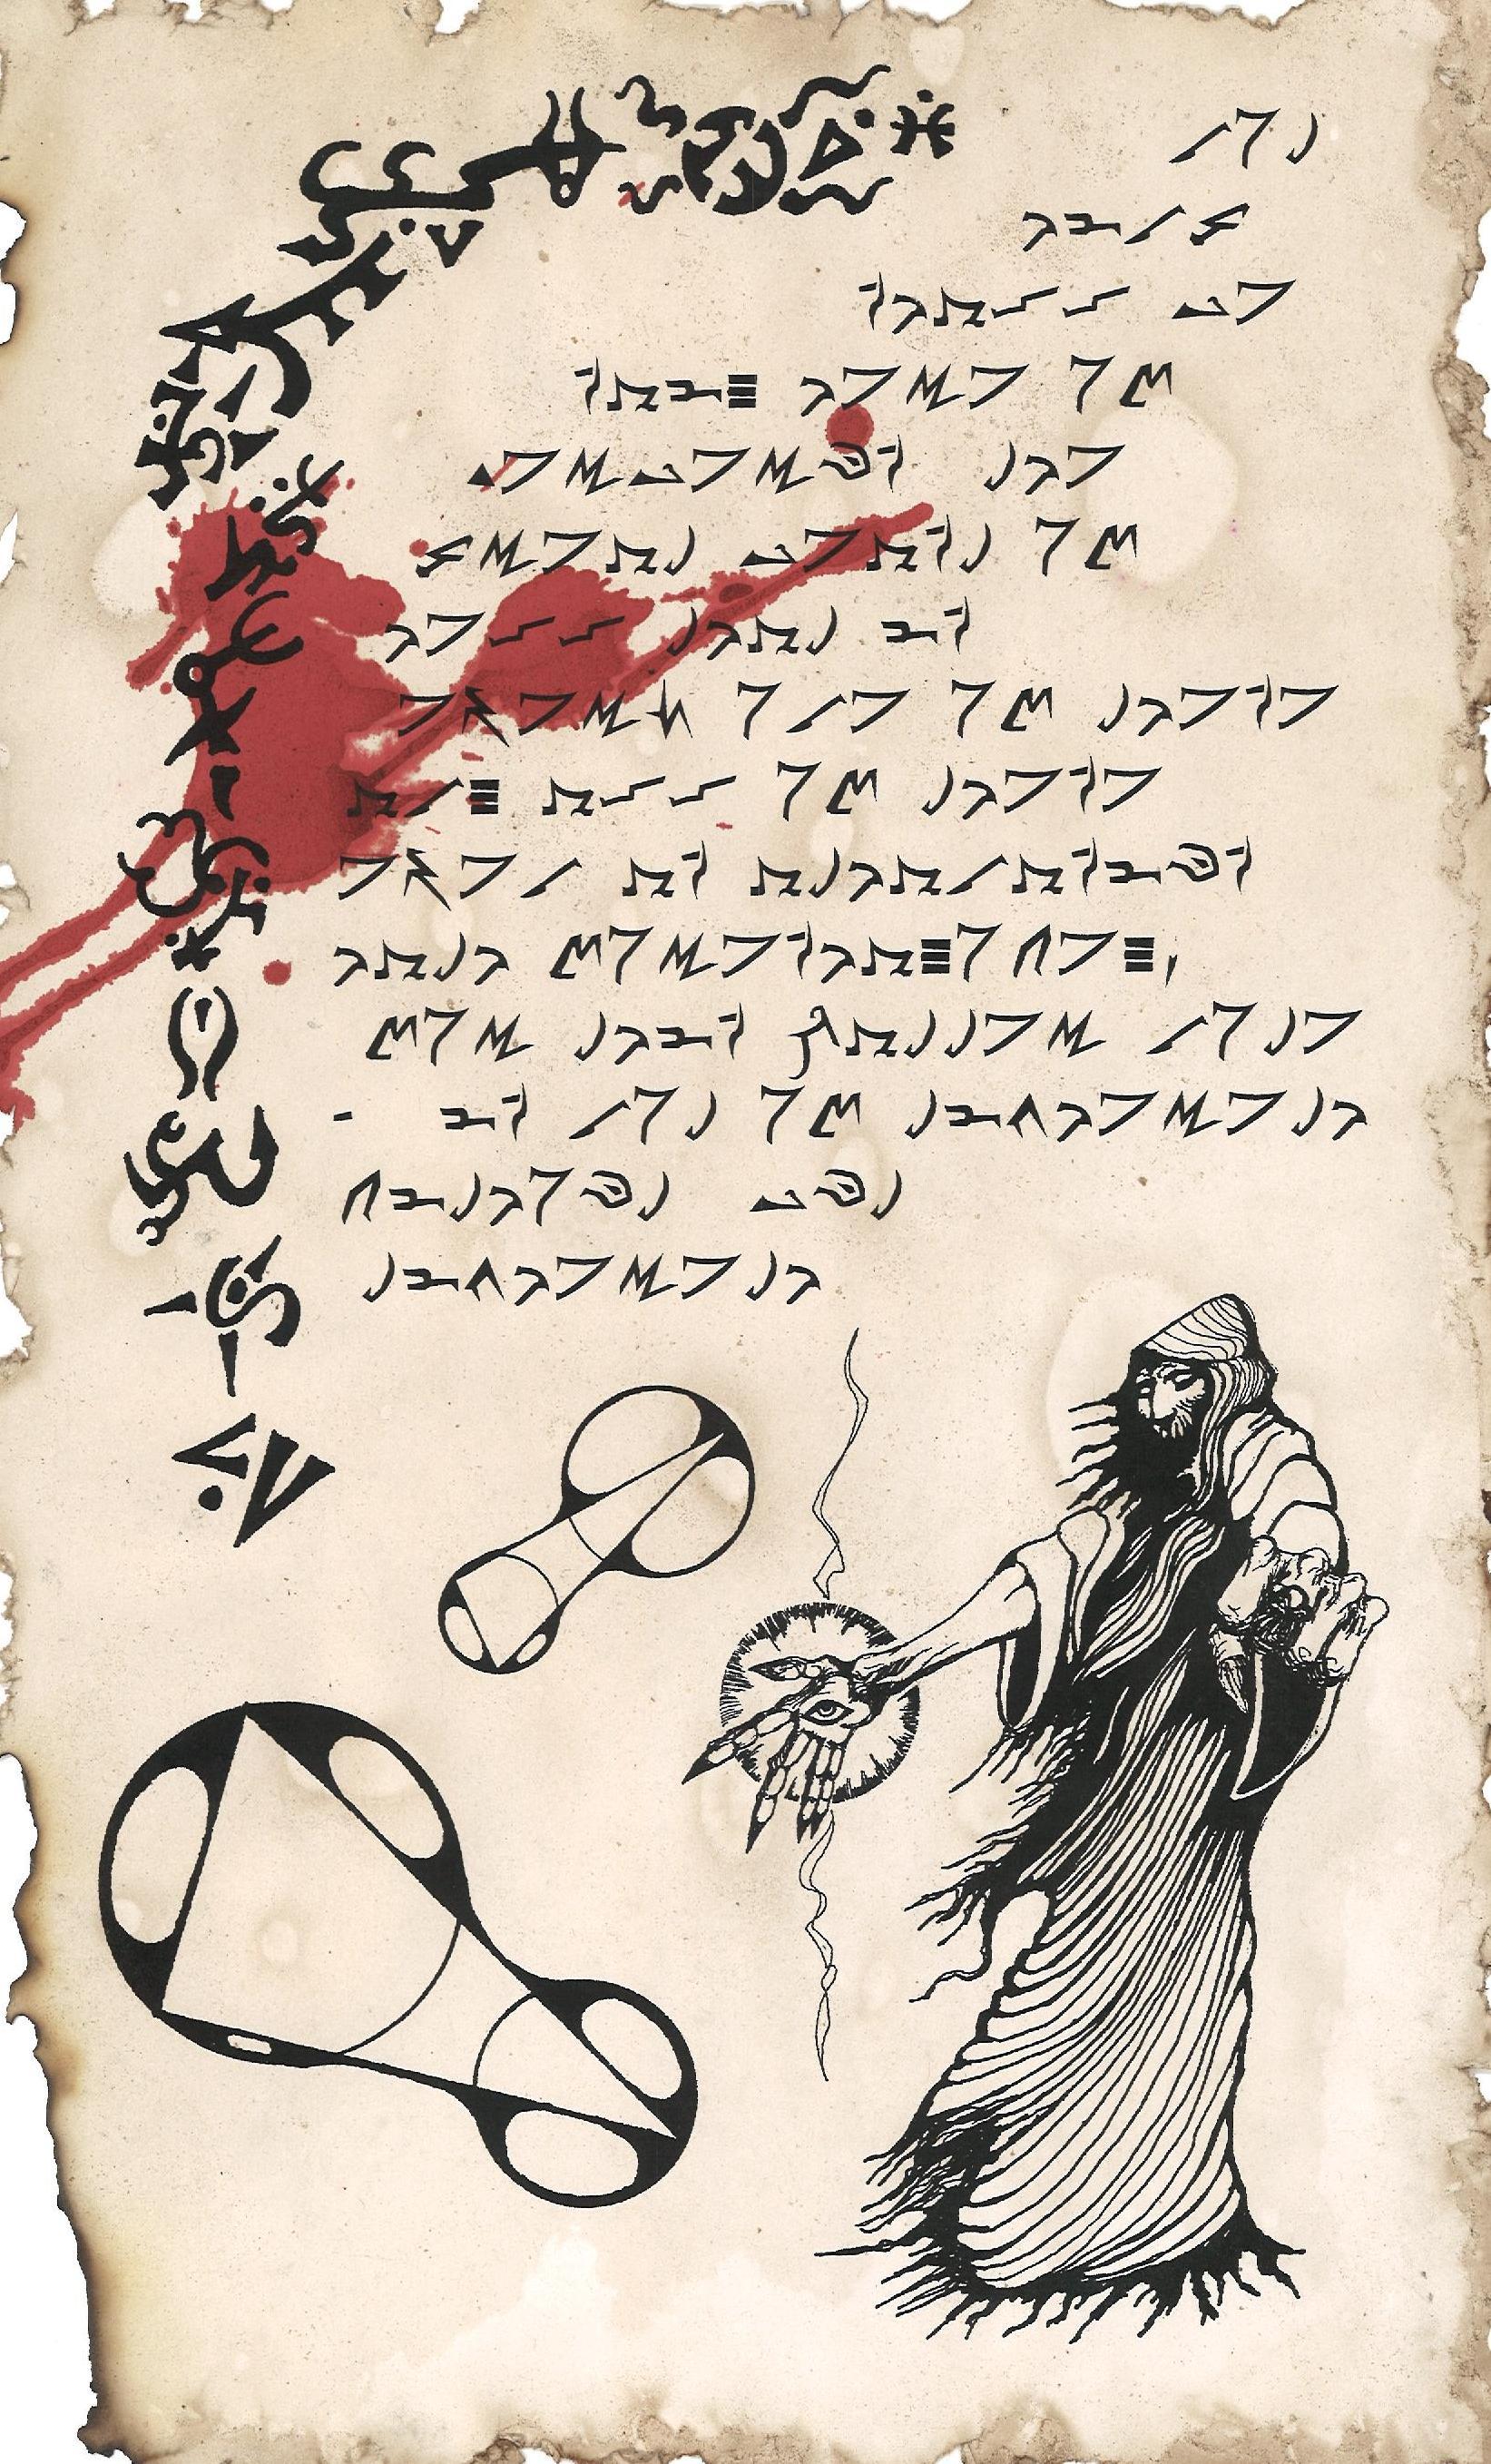 Necronomican pg 11 page 001